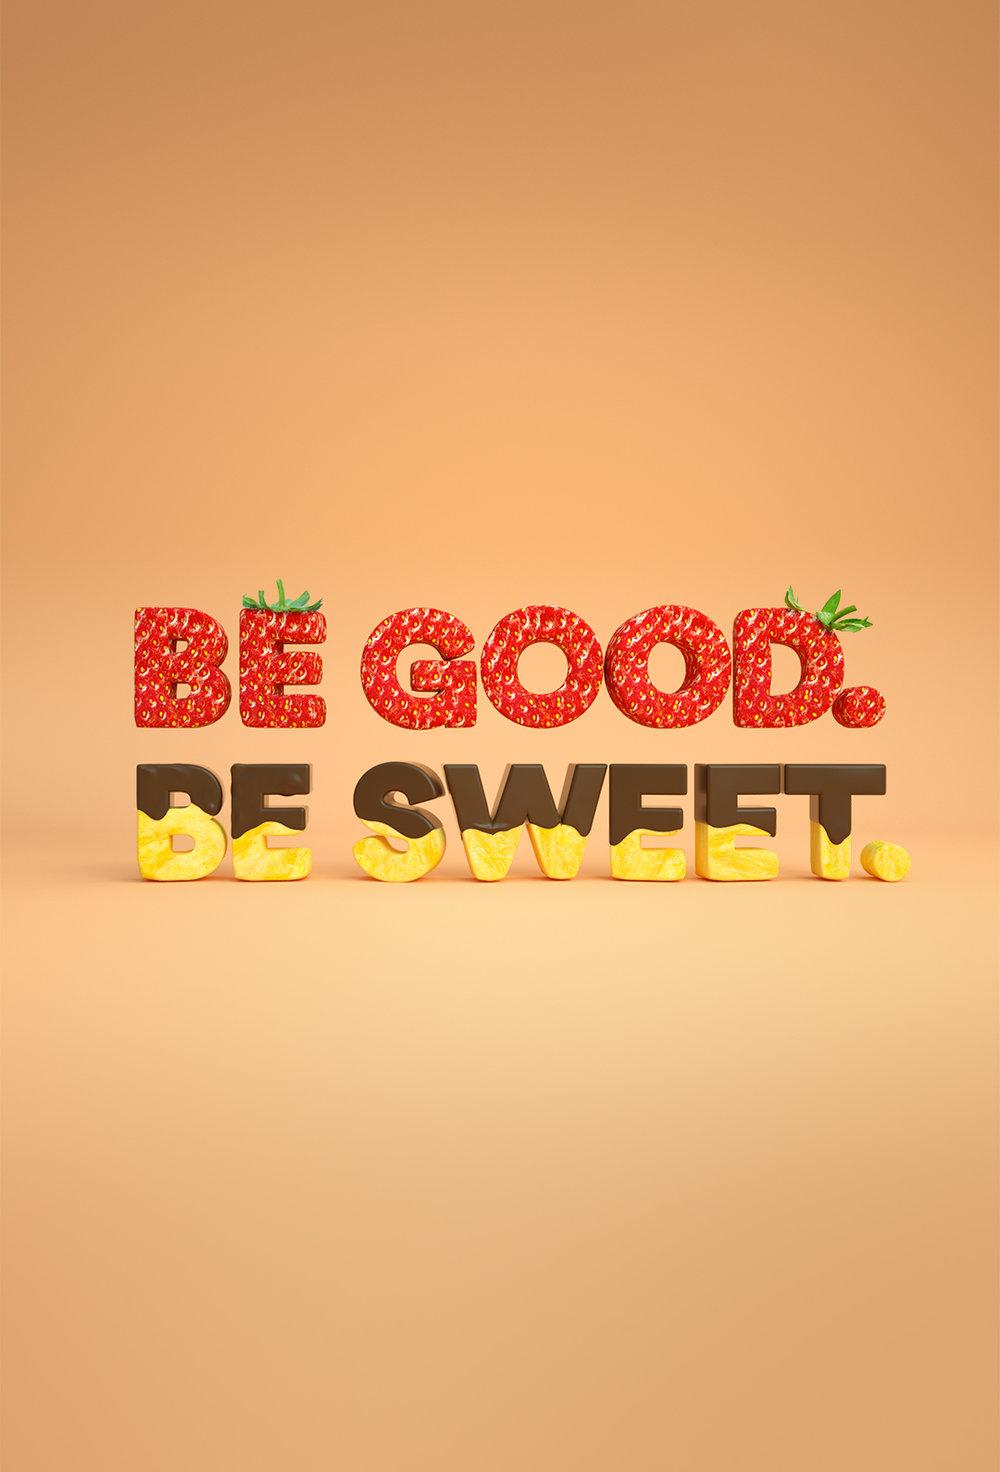 be-good-be-sweet.jpg